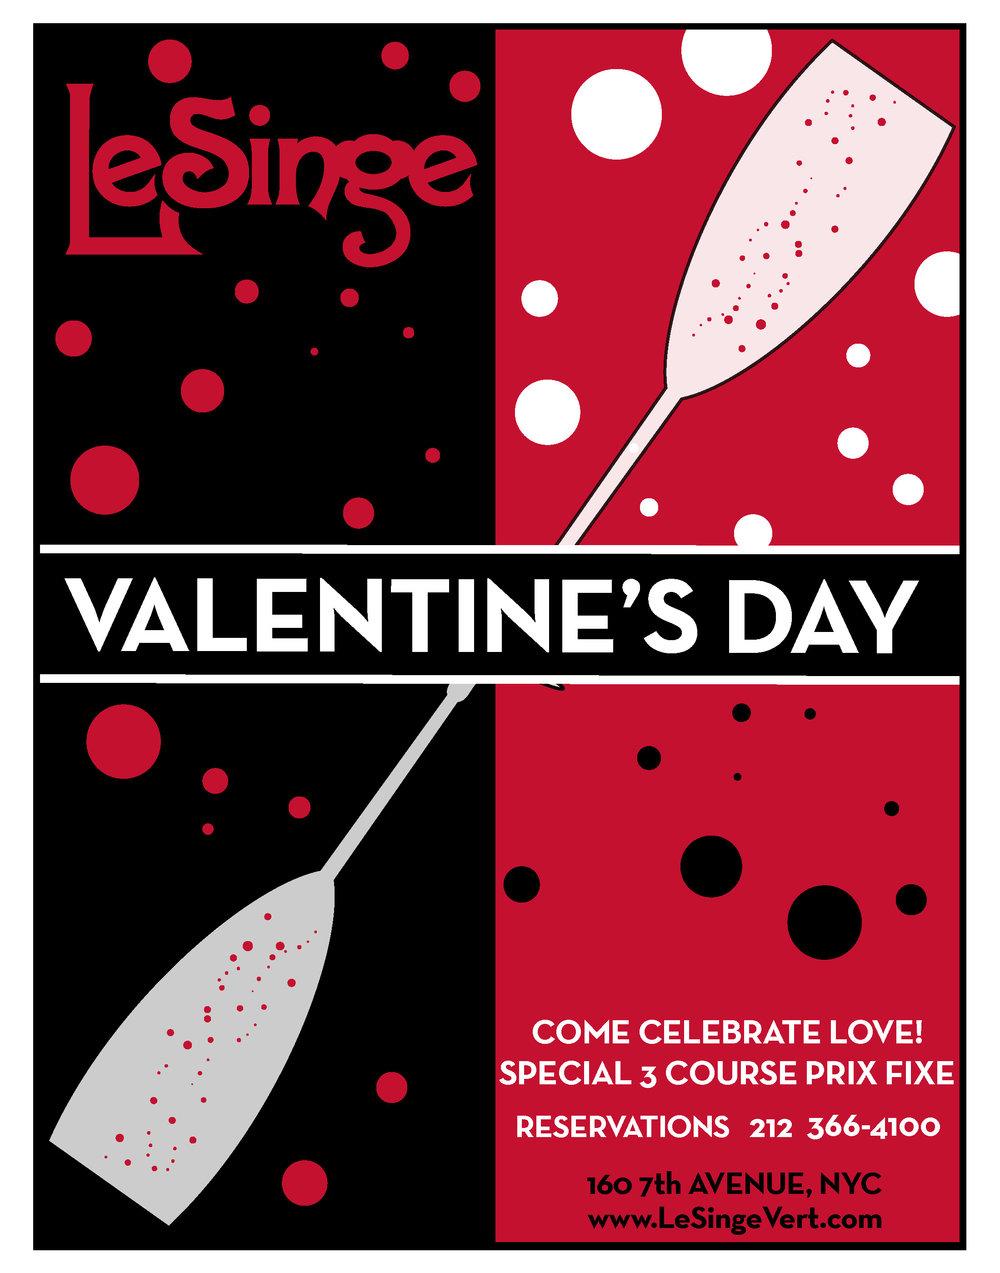 JU Valentines Poster 2018.jpg